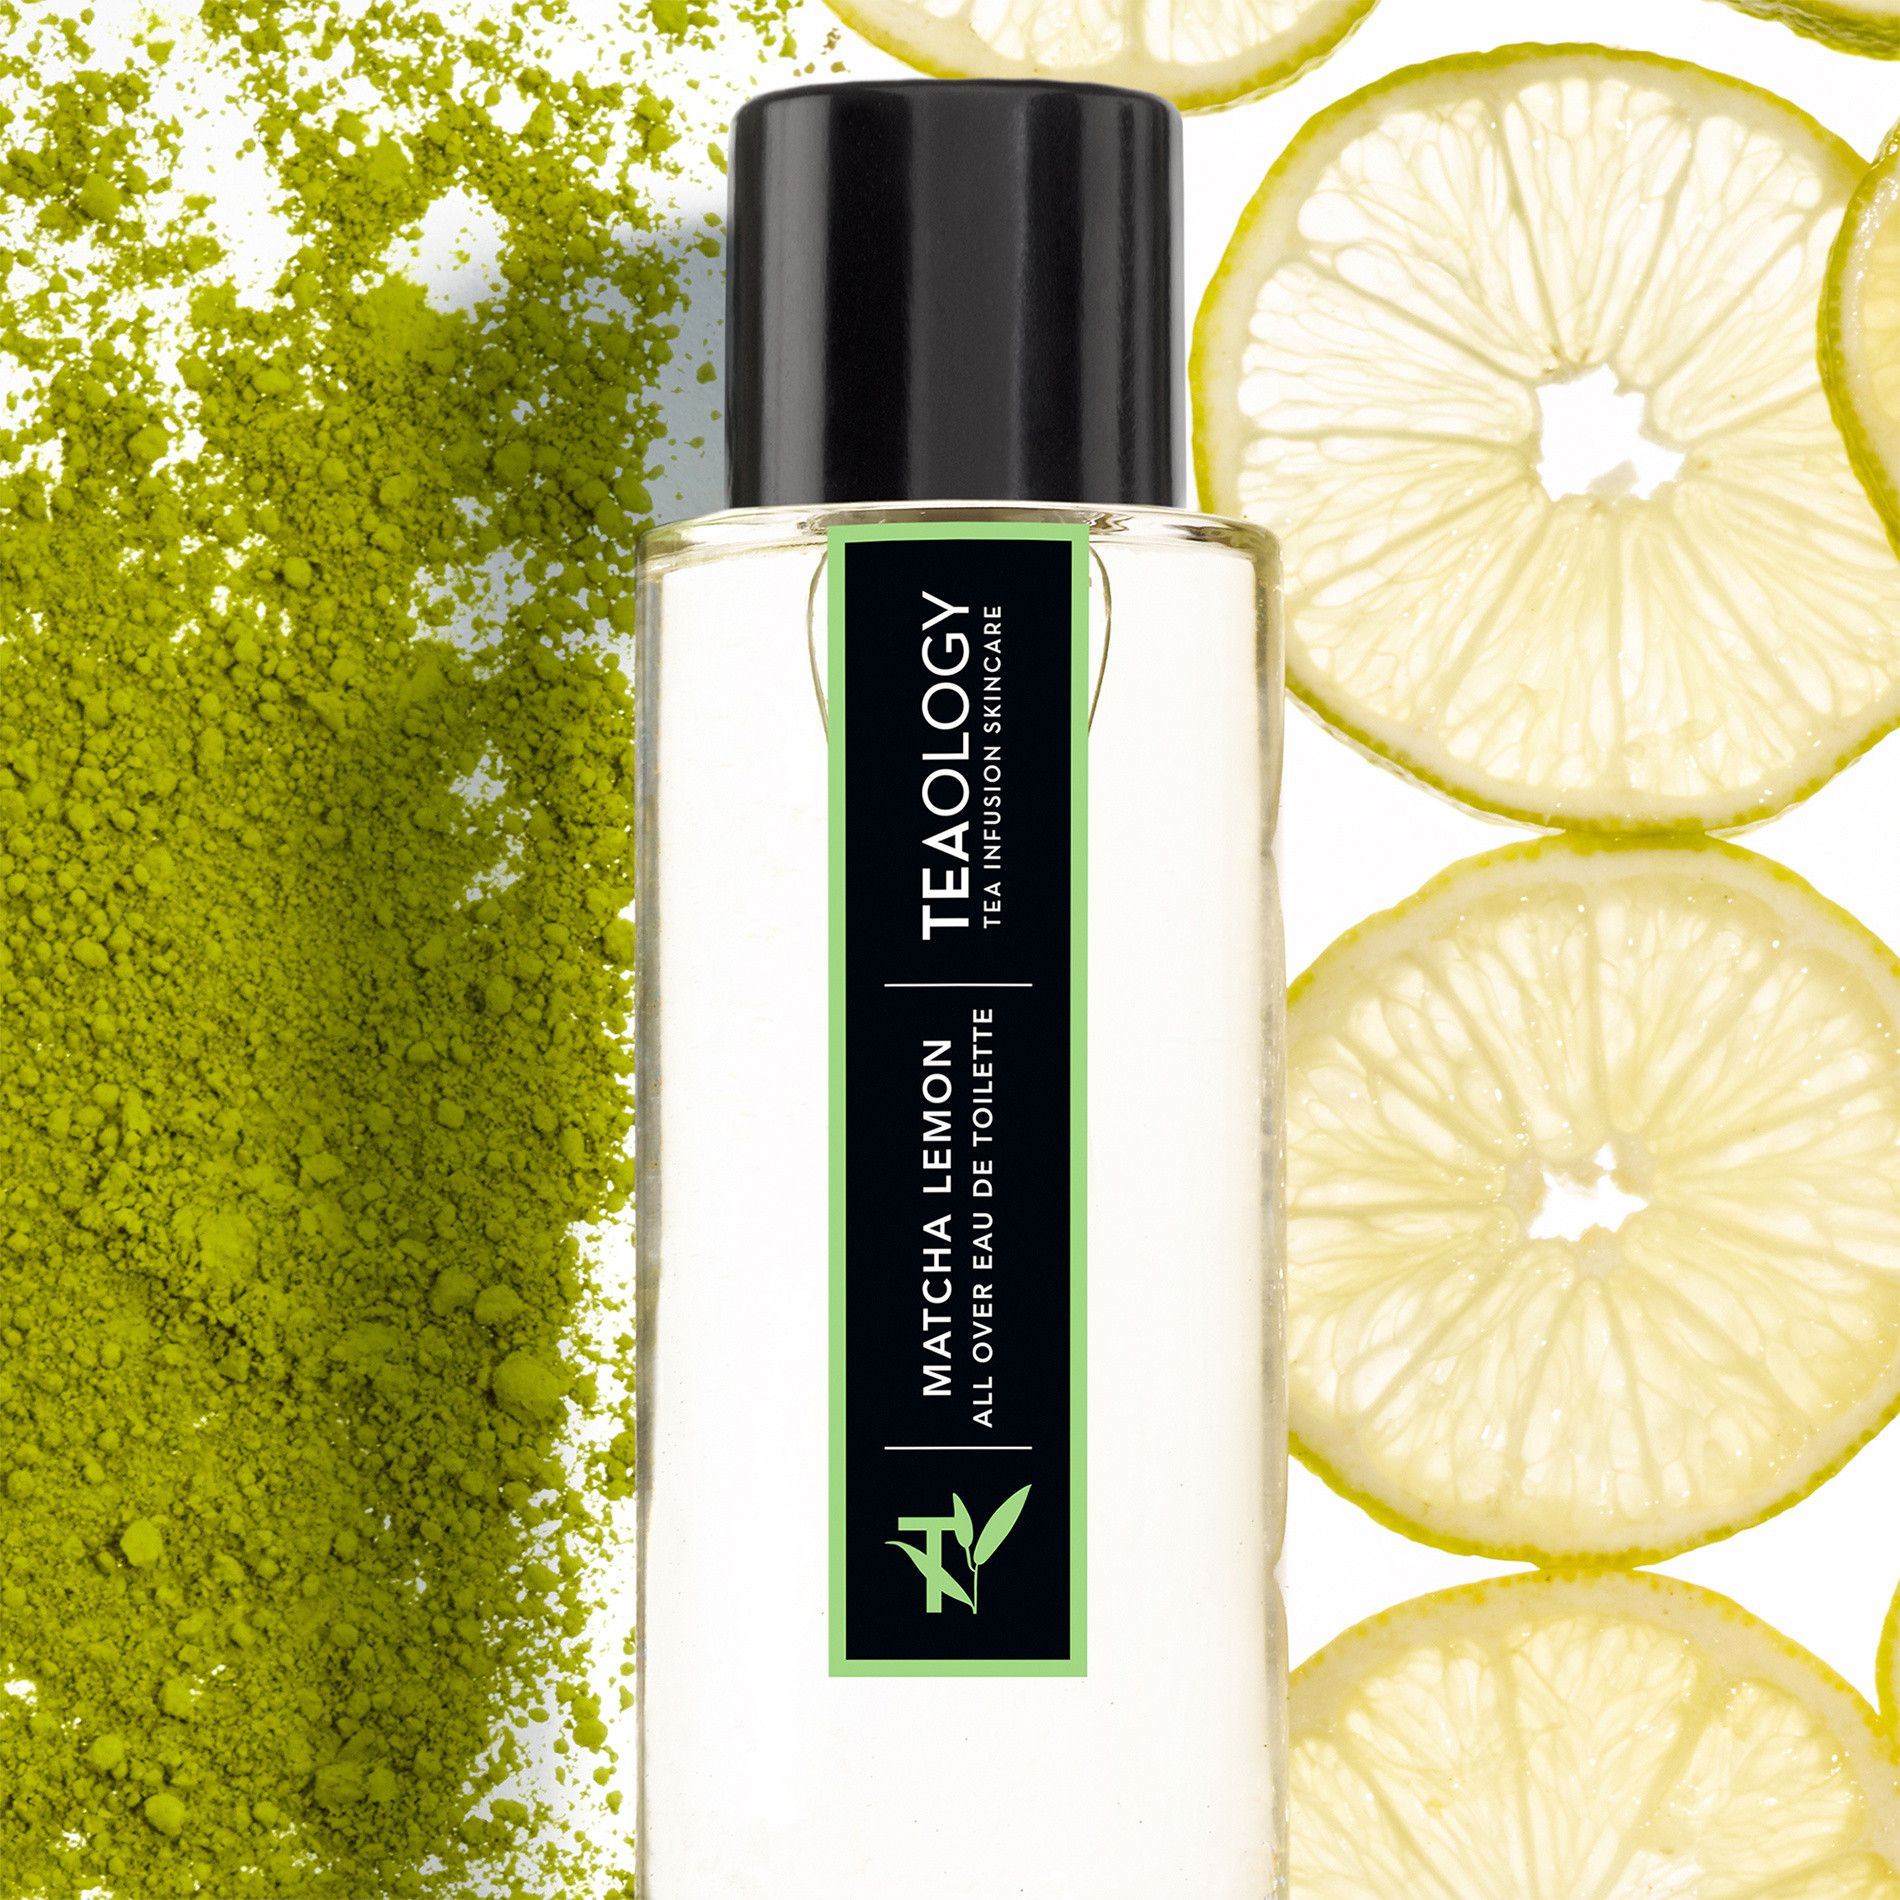 Teaology Matcha Lemon Eau de Toilette 100 ml, Bianco, large image number 2